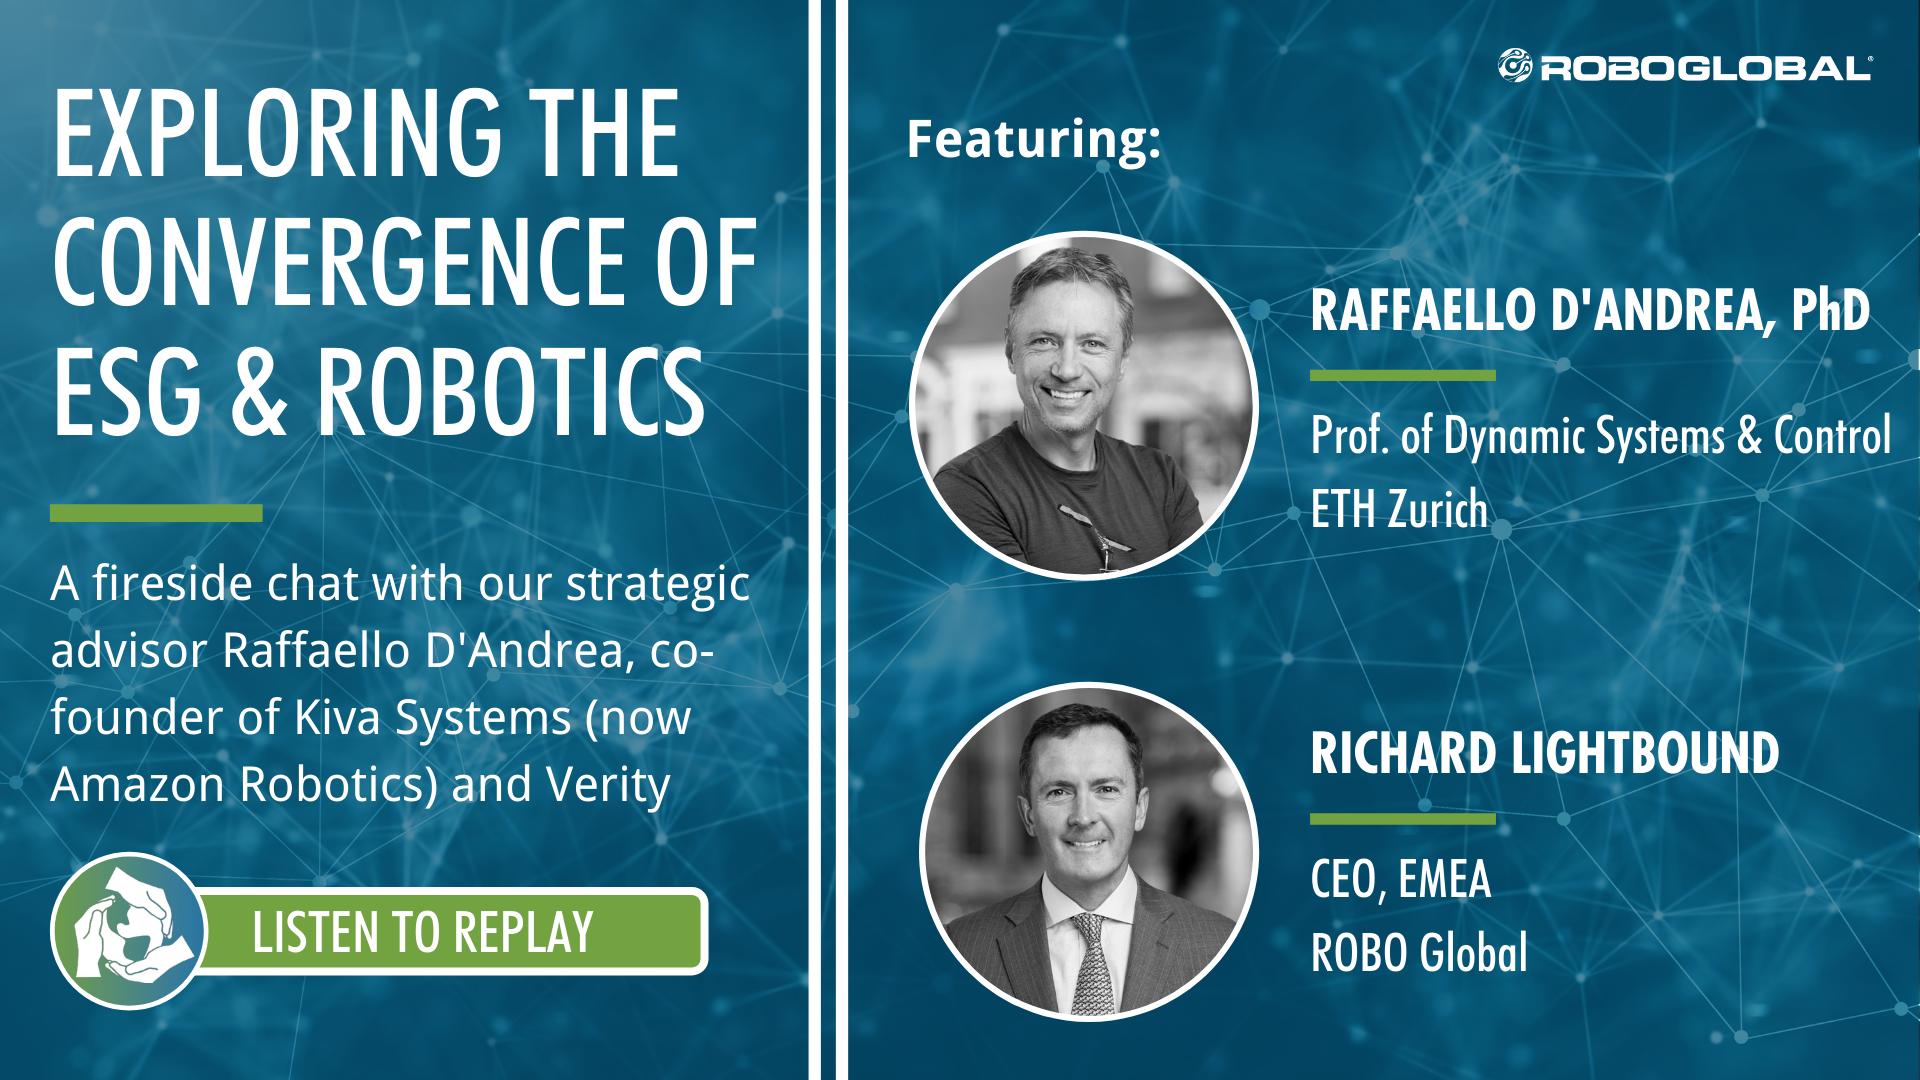 The Convergence of ESG & Robotics Webinar